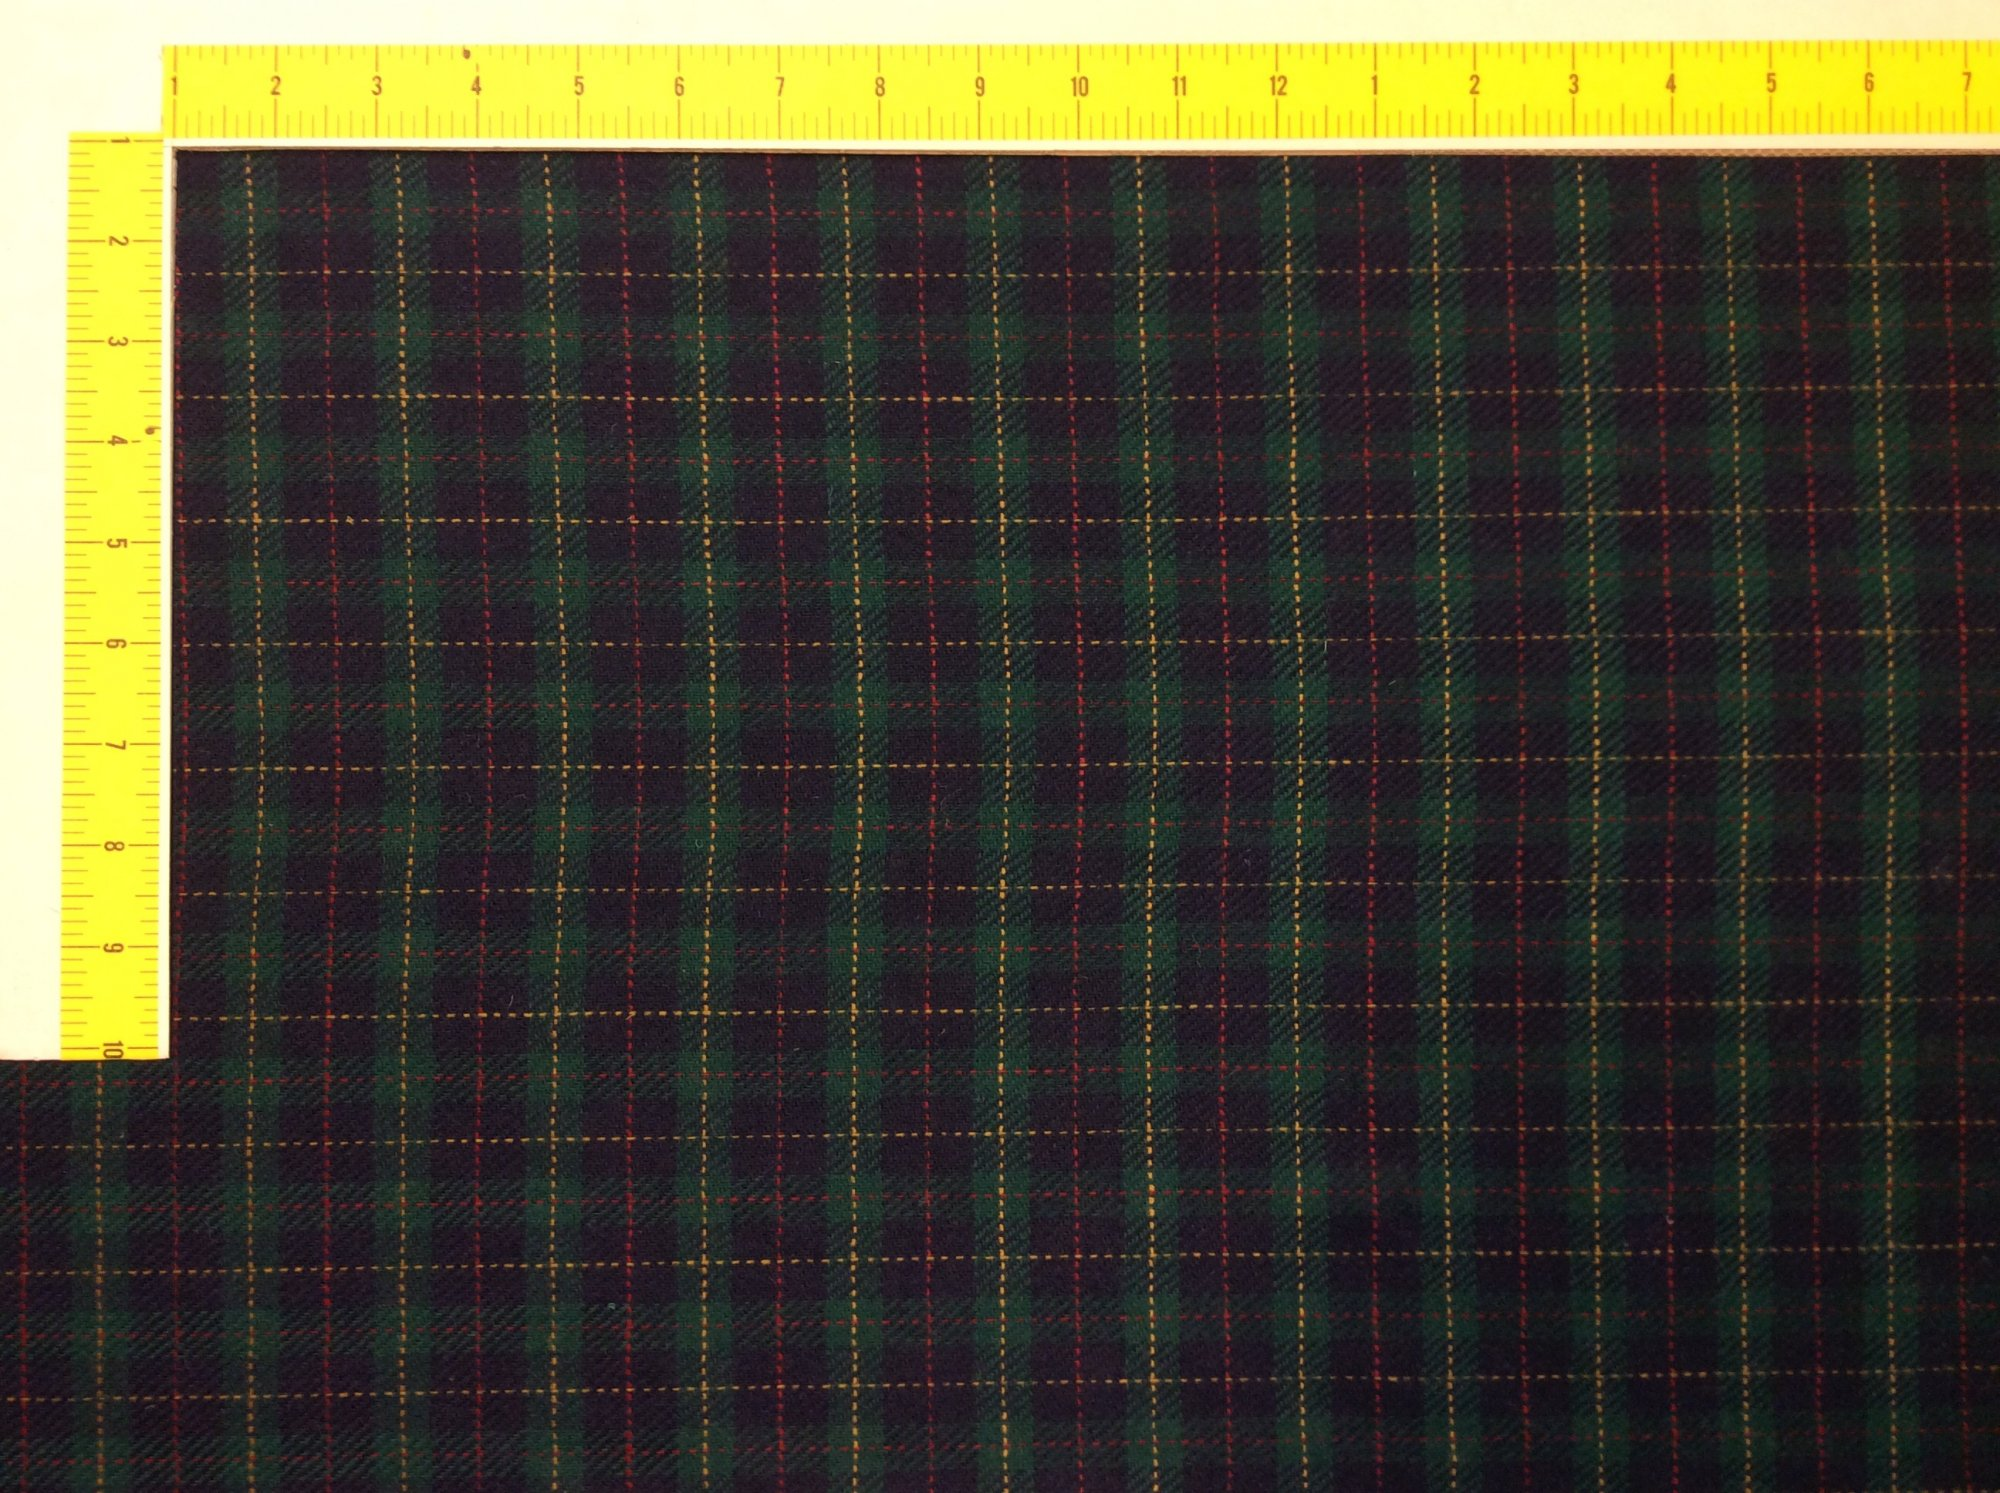 Plaid Tartan 100% wool Green Navy Red Apparel fabric Home Dec fabric NL250